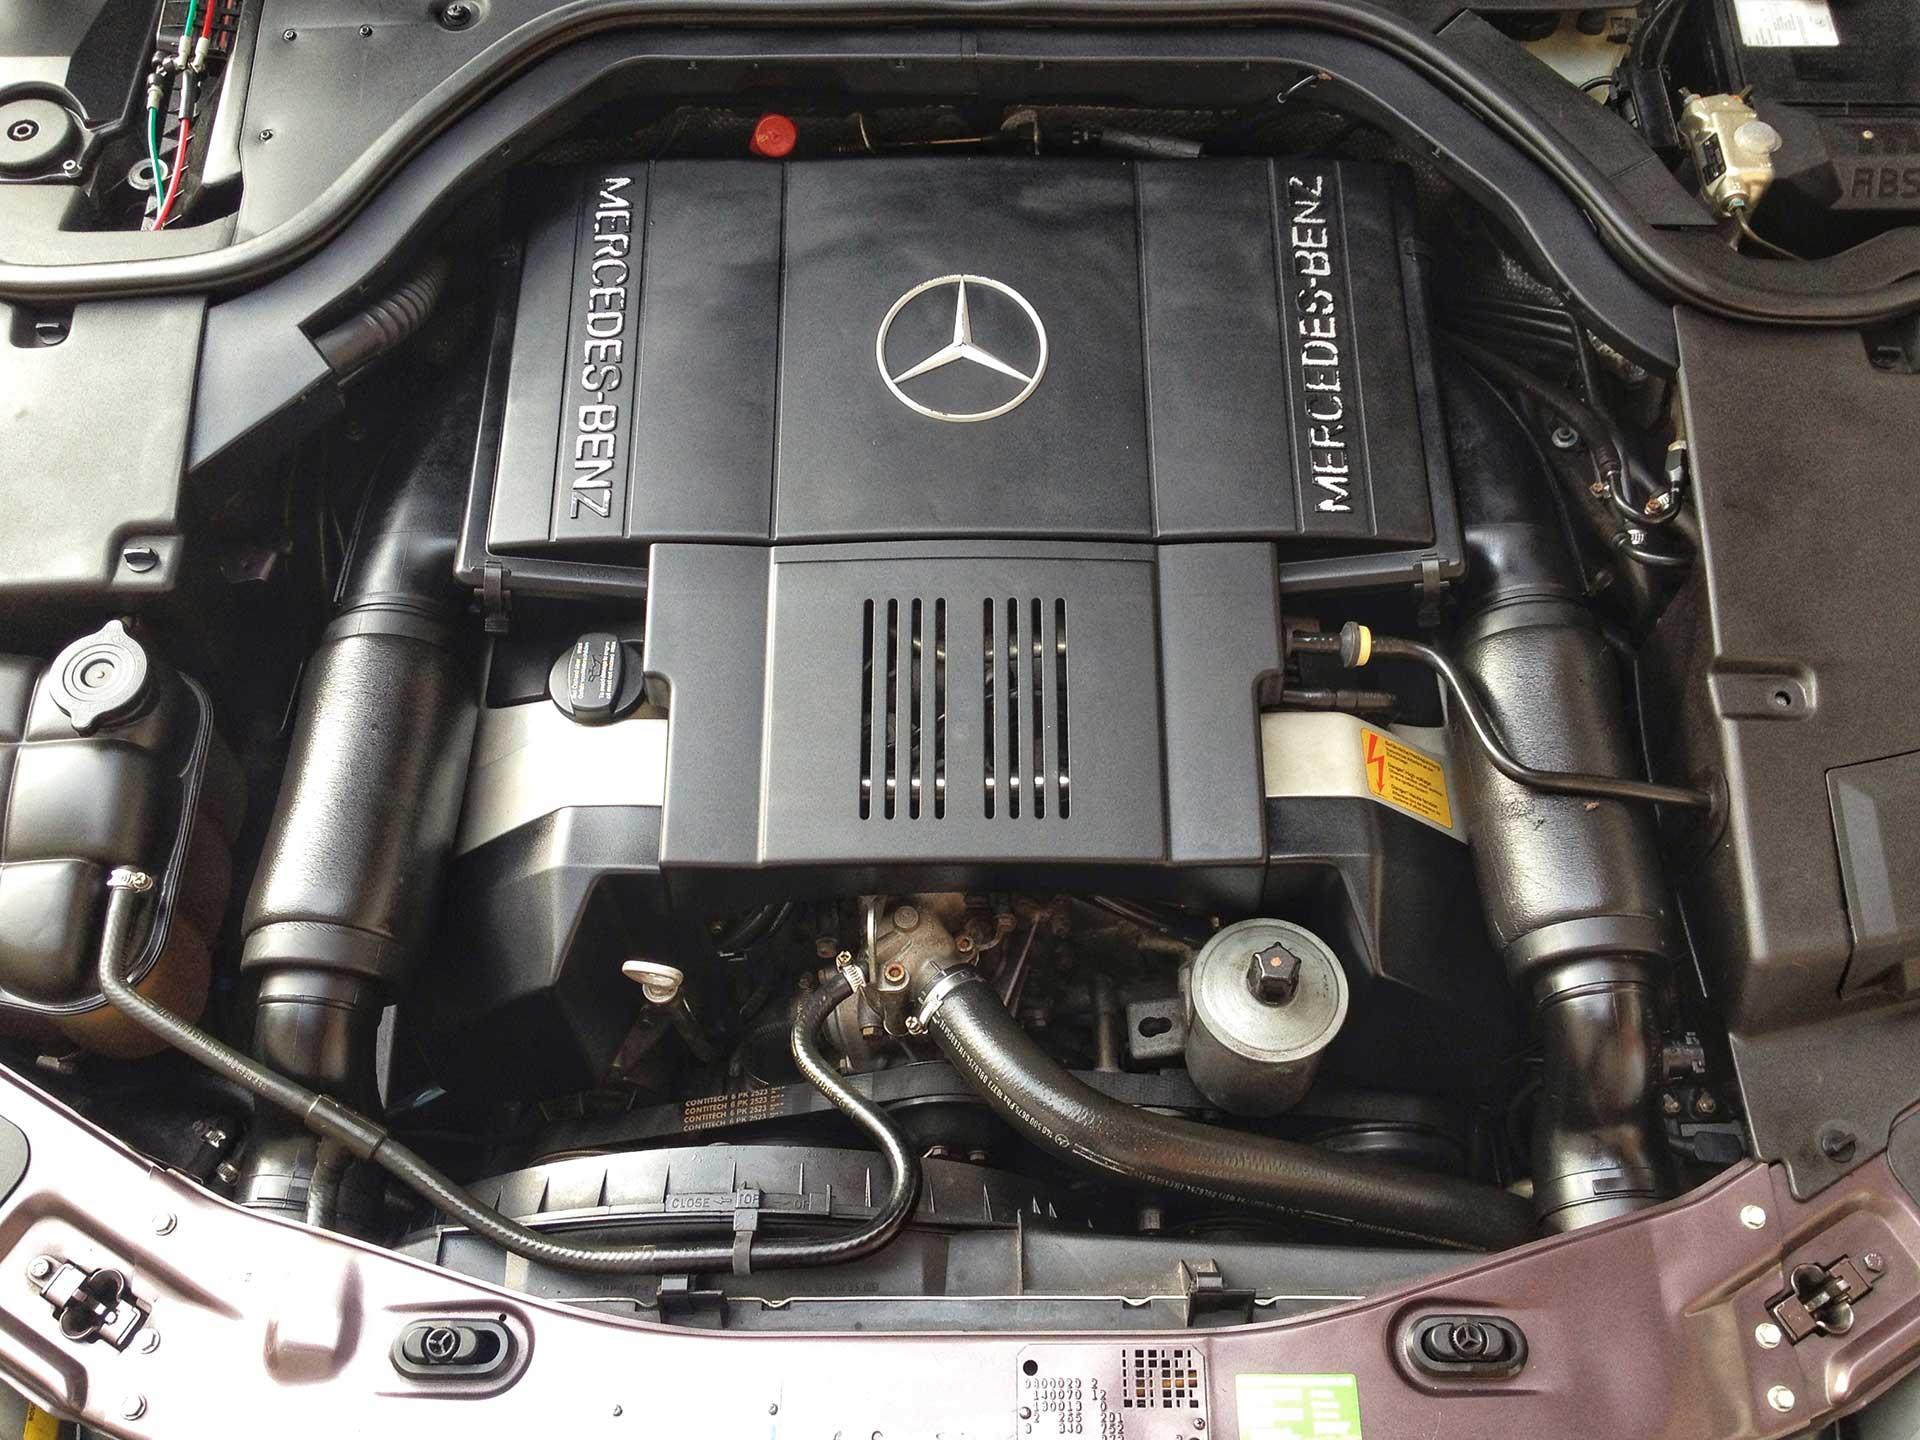 Motor - CL 500 C140